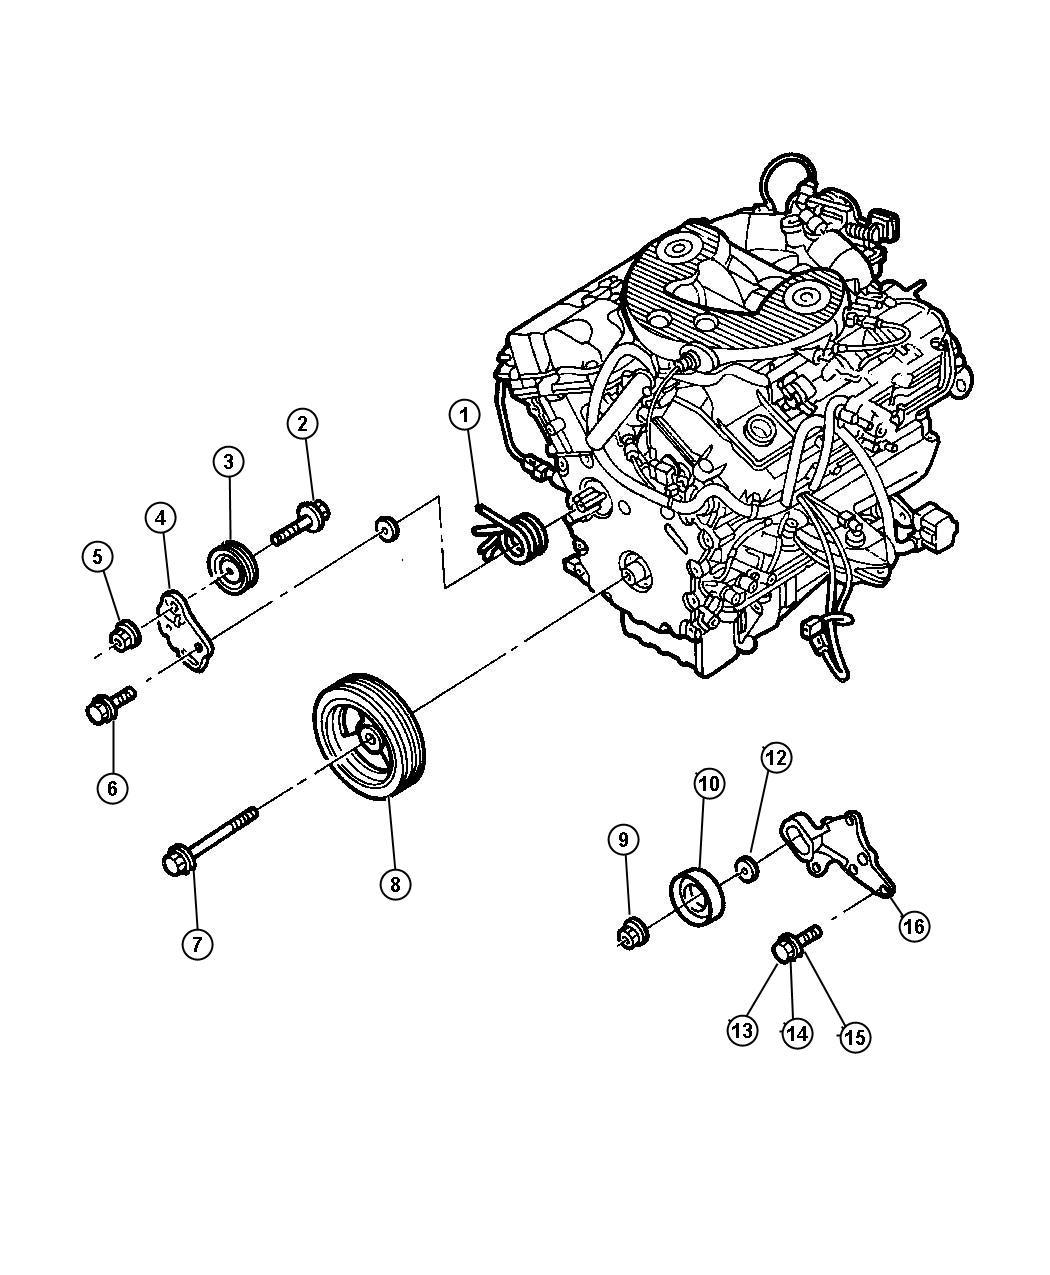 2003 Dodge Intrepid 2.7L V6 DOHC 24 Valve MPI, 4-Speed